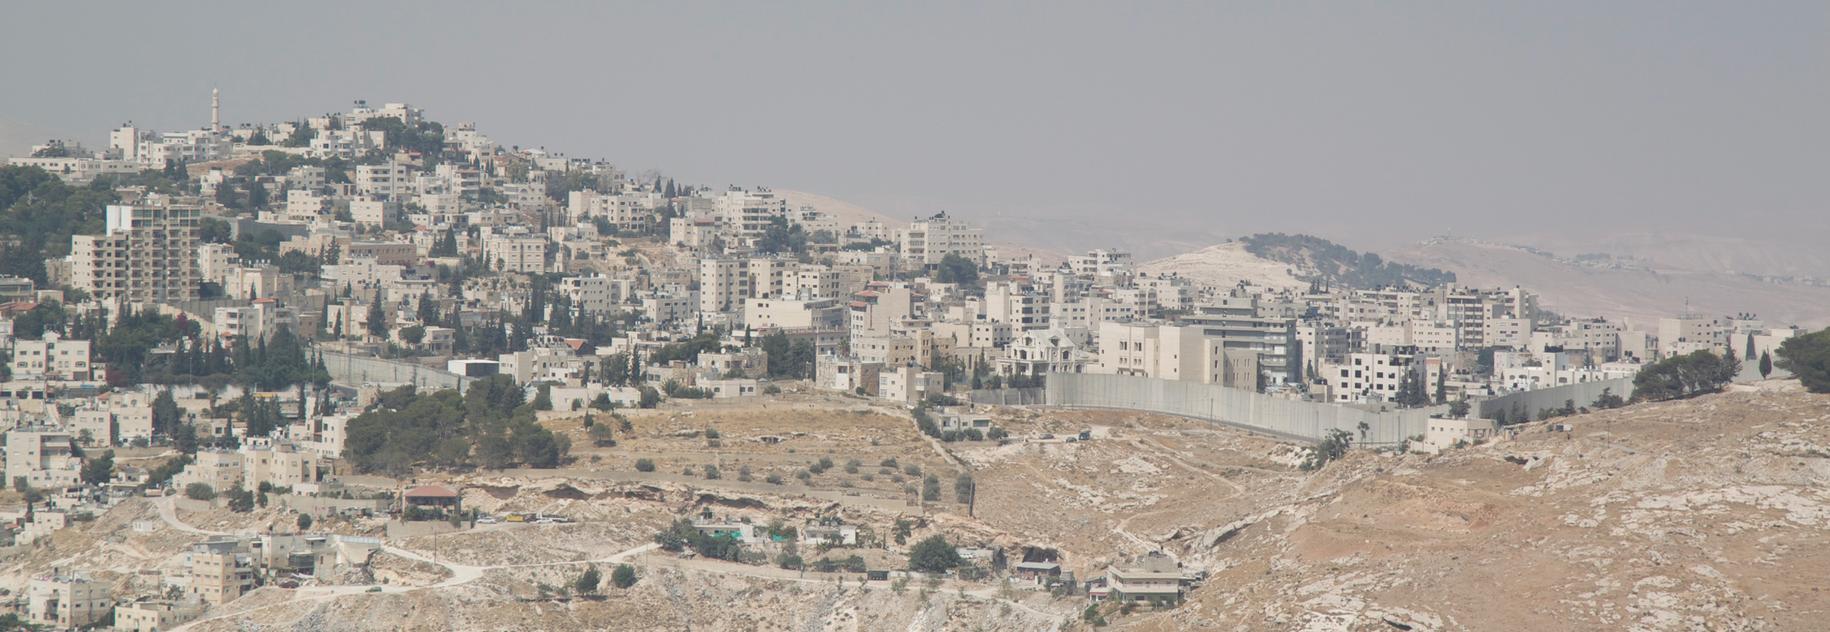 December 2017 Demolition and Displacement report